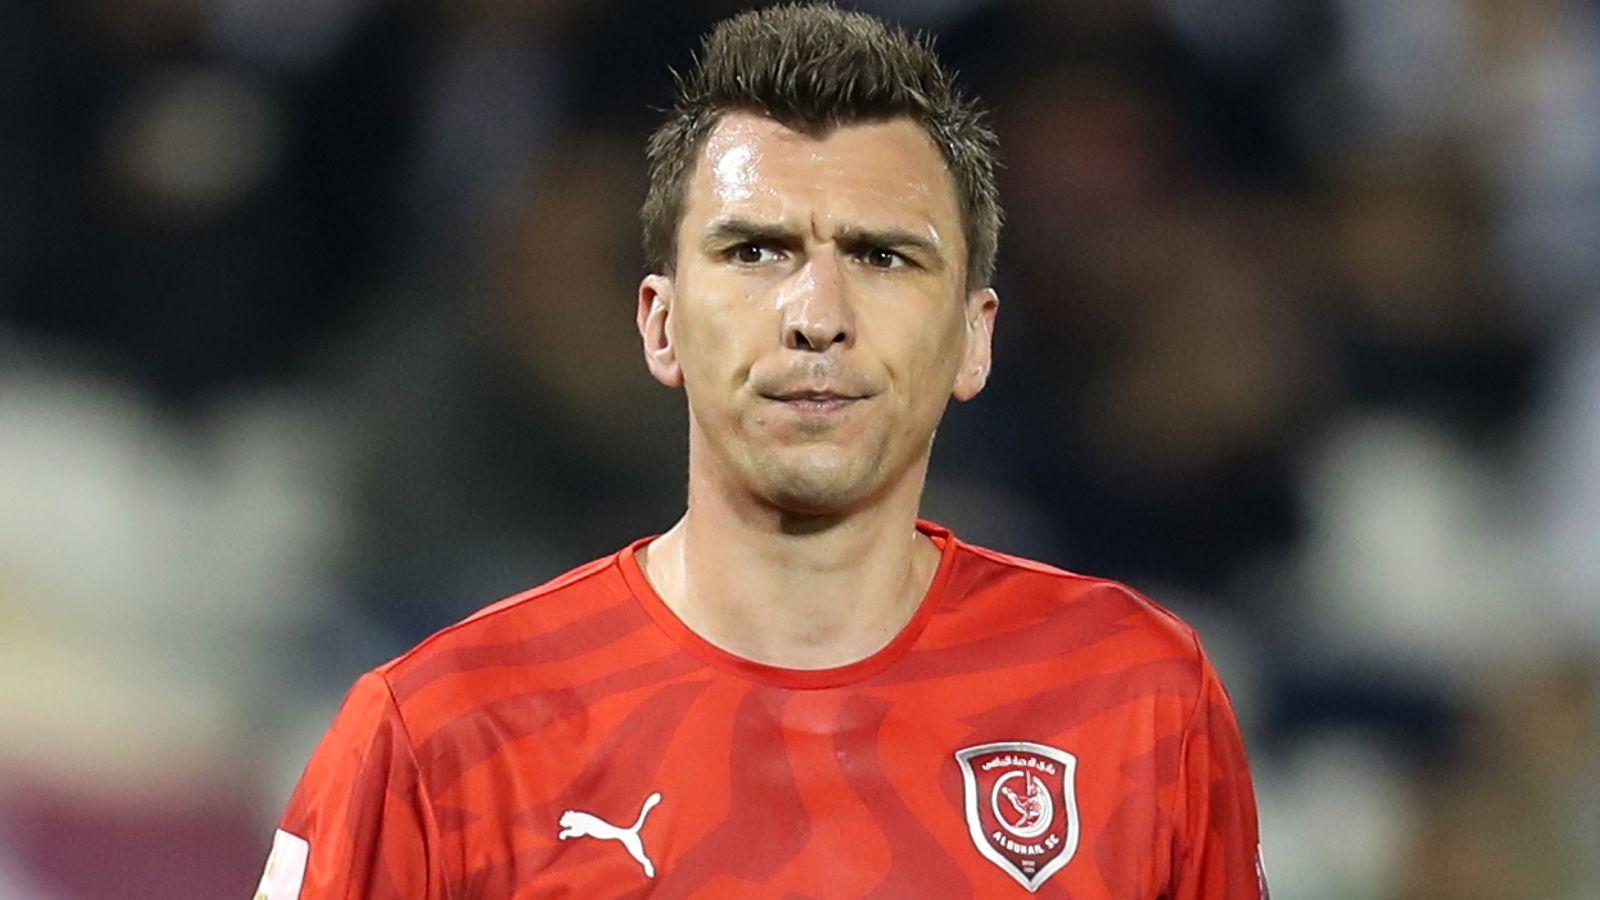 Mario Mandzukic: Former Manchester United target leaves Al-Duhail